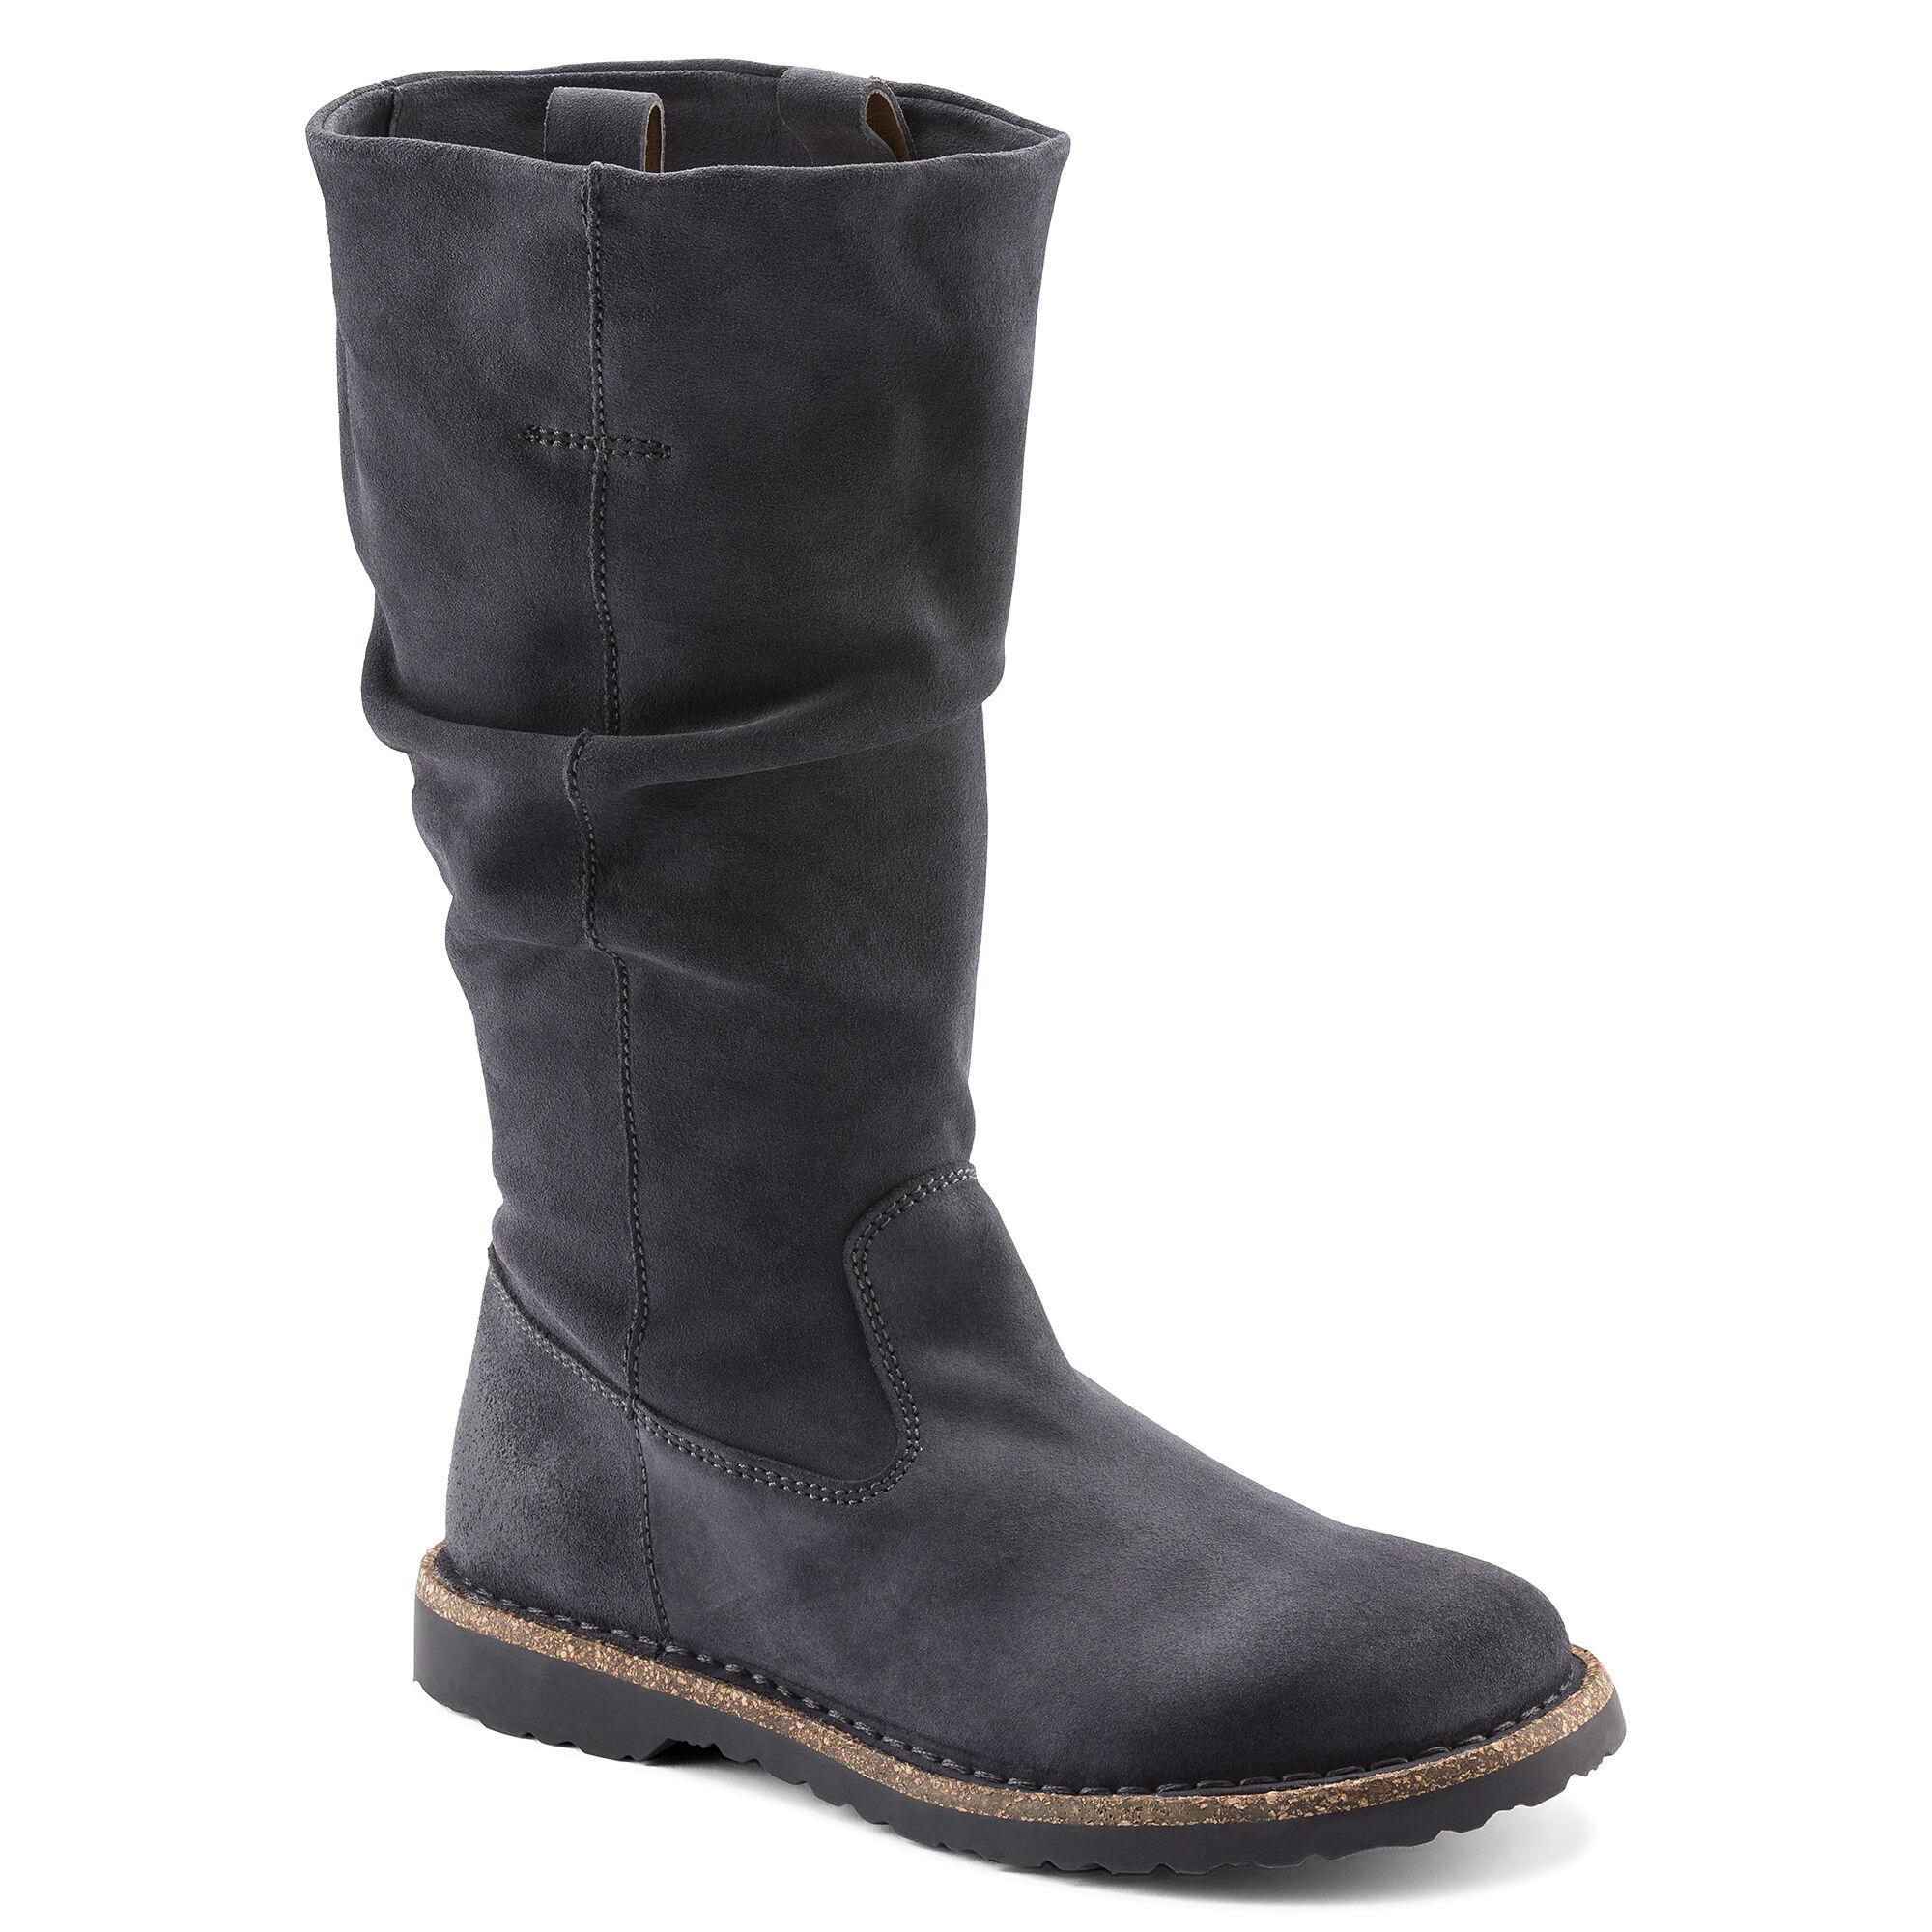 Stivali donna  acquista online su BIRKENSTOCK